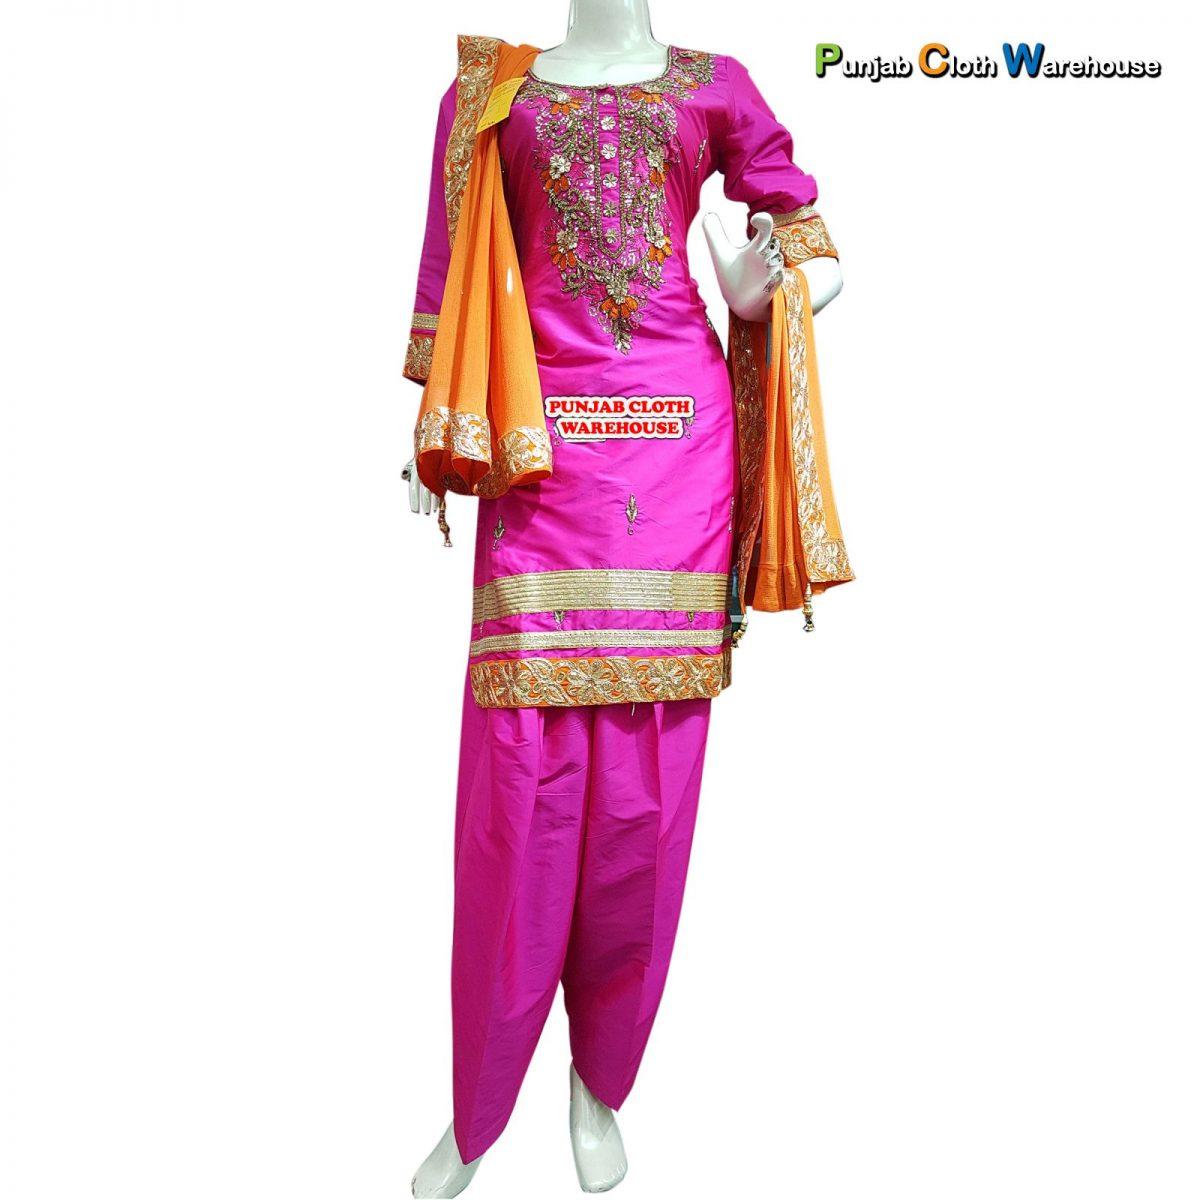 Designer Party Wear Suits, Sarees, Lehengas & Sherwanis (27)